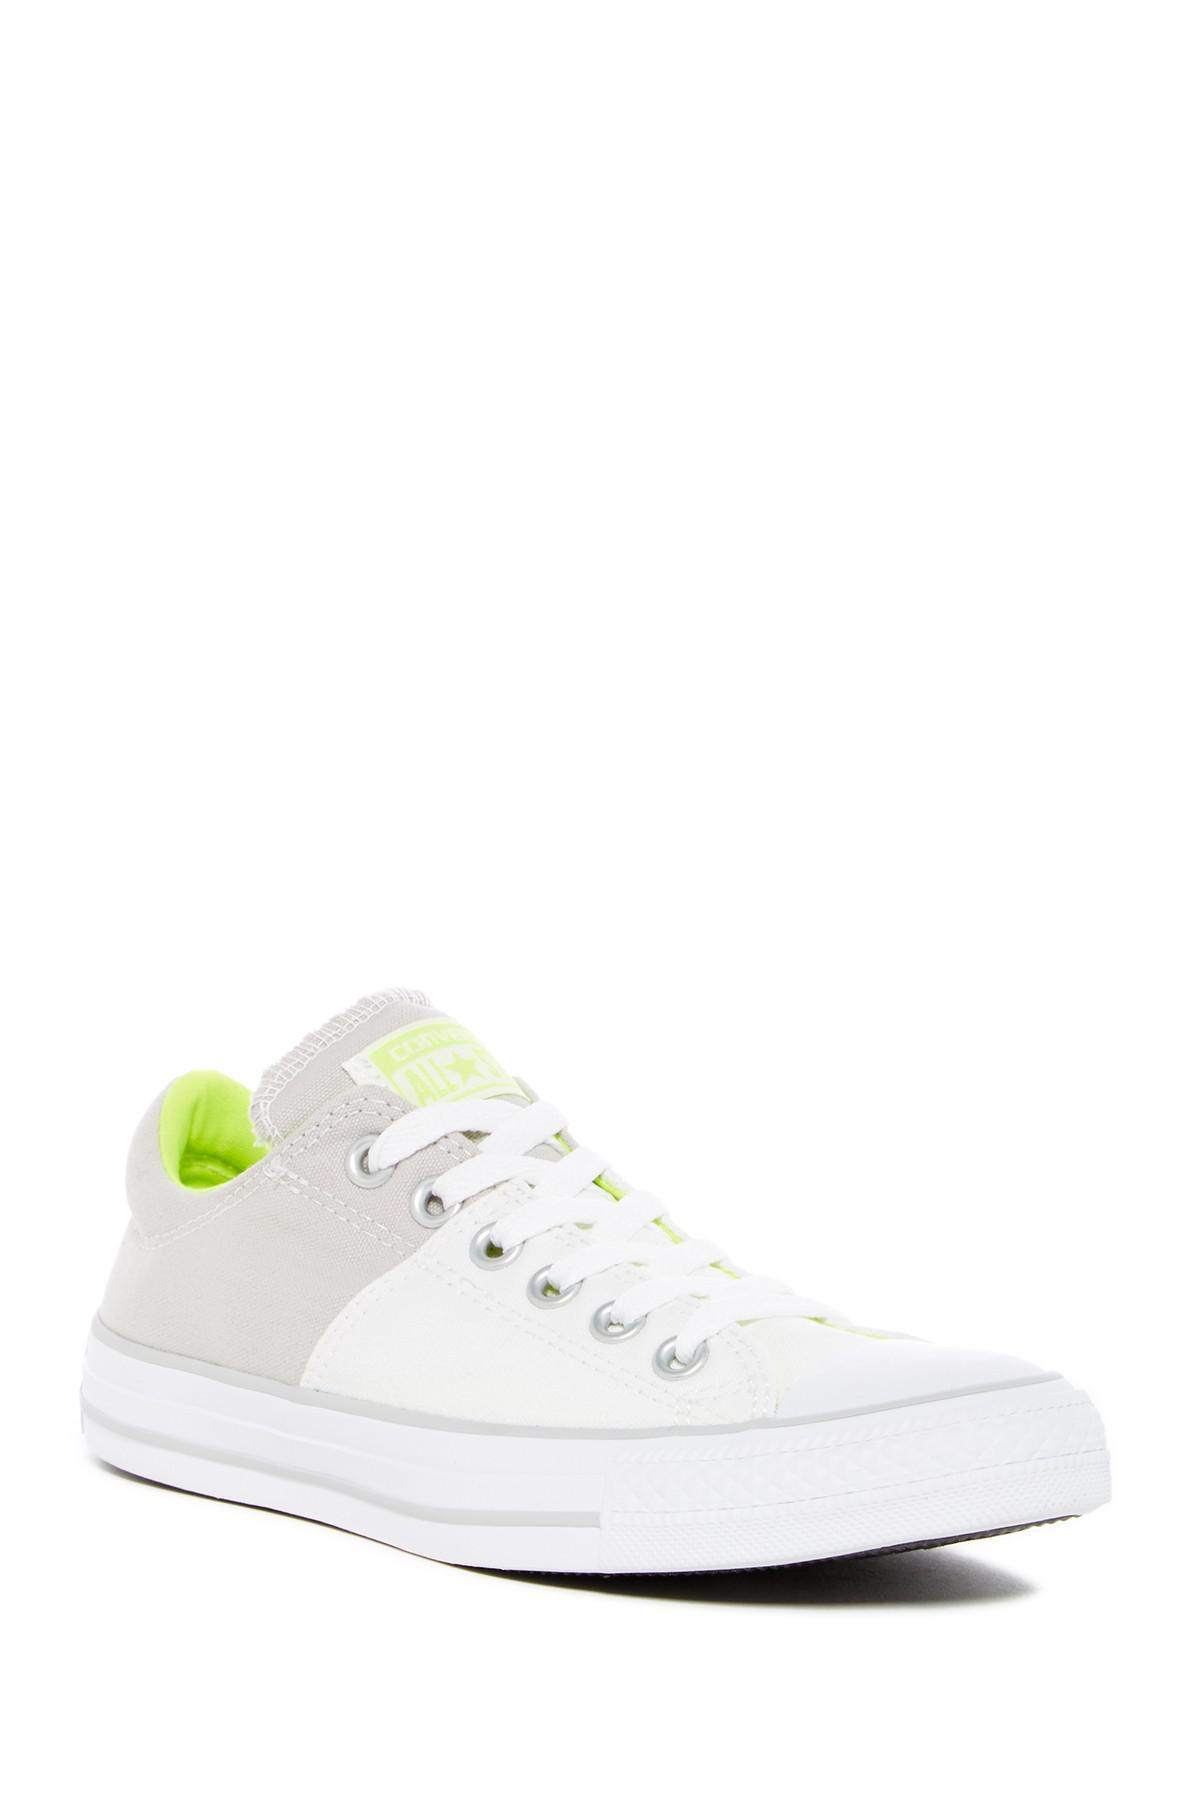 faab7d809b97 Converse. White Chuck Taylor All Star Madison Color Block Sneaker (women)